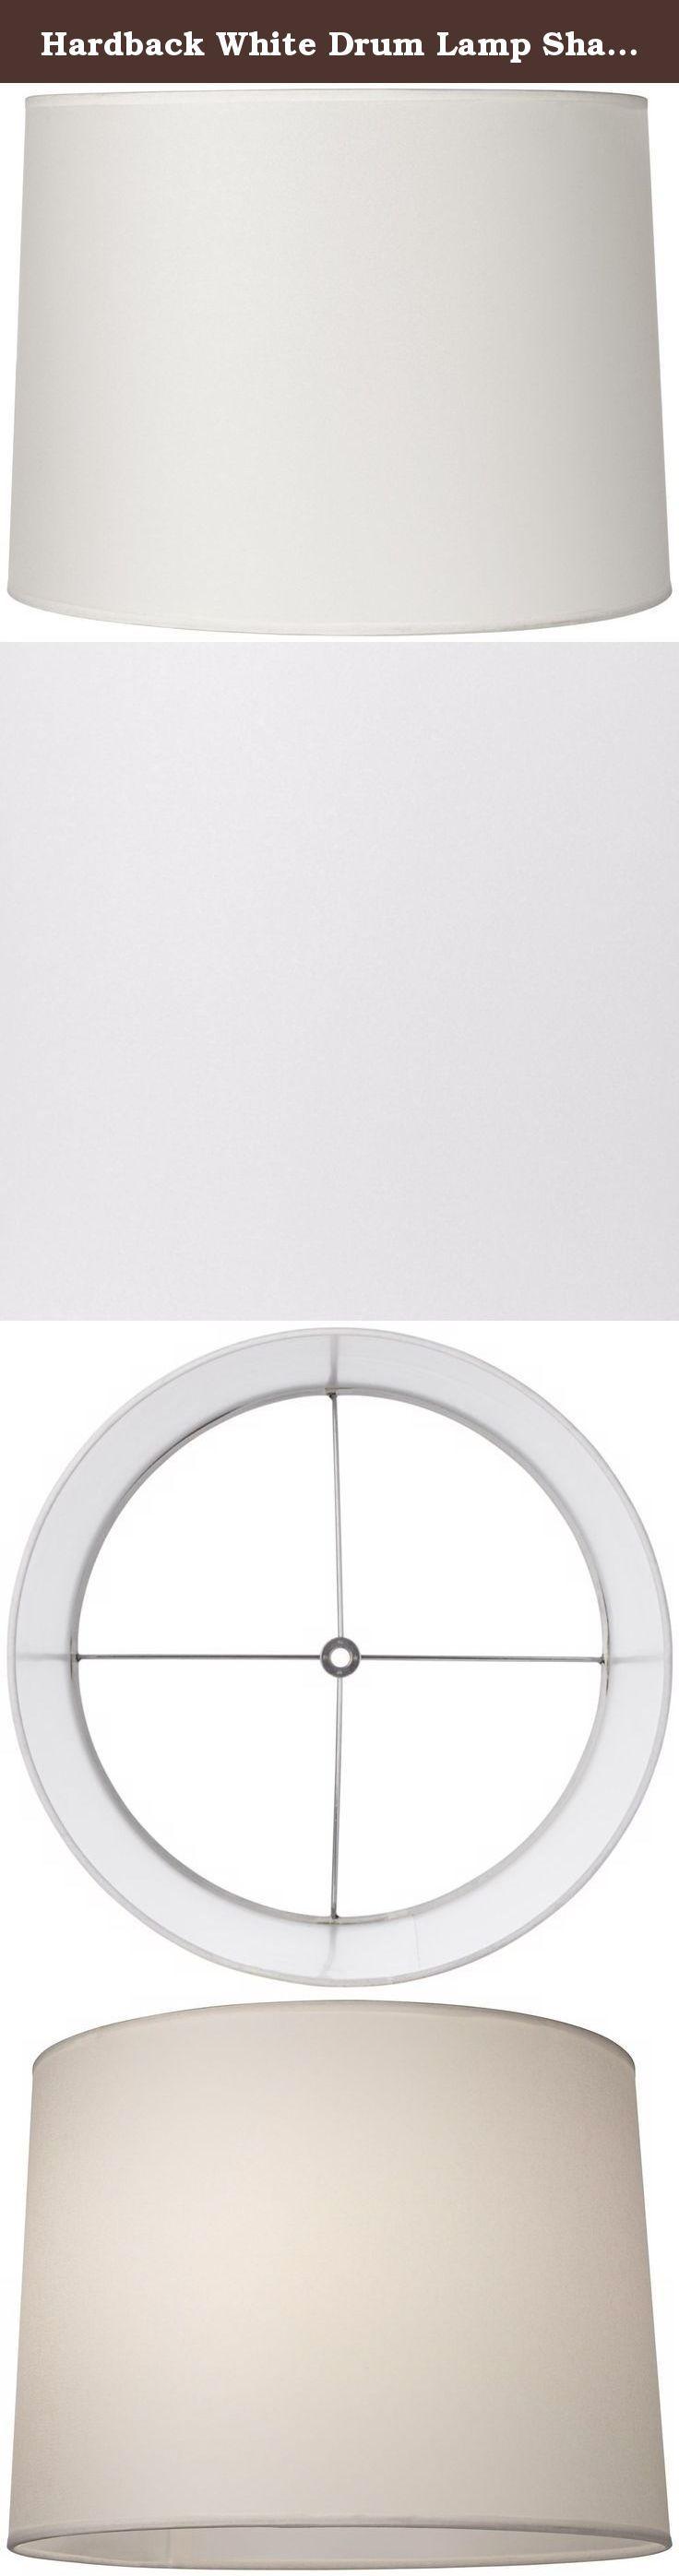 Table lamp harp sizes - Hardback White Drum Lamp Shade 13x14x10 Spider This Contemporary Hardback White Drum Shade